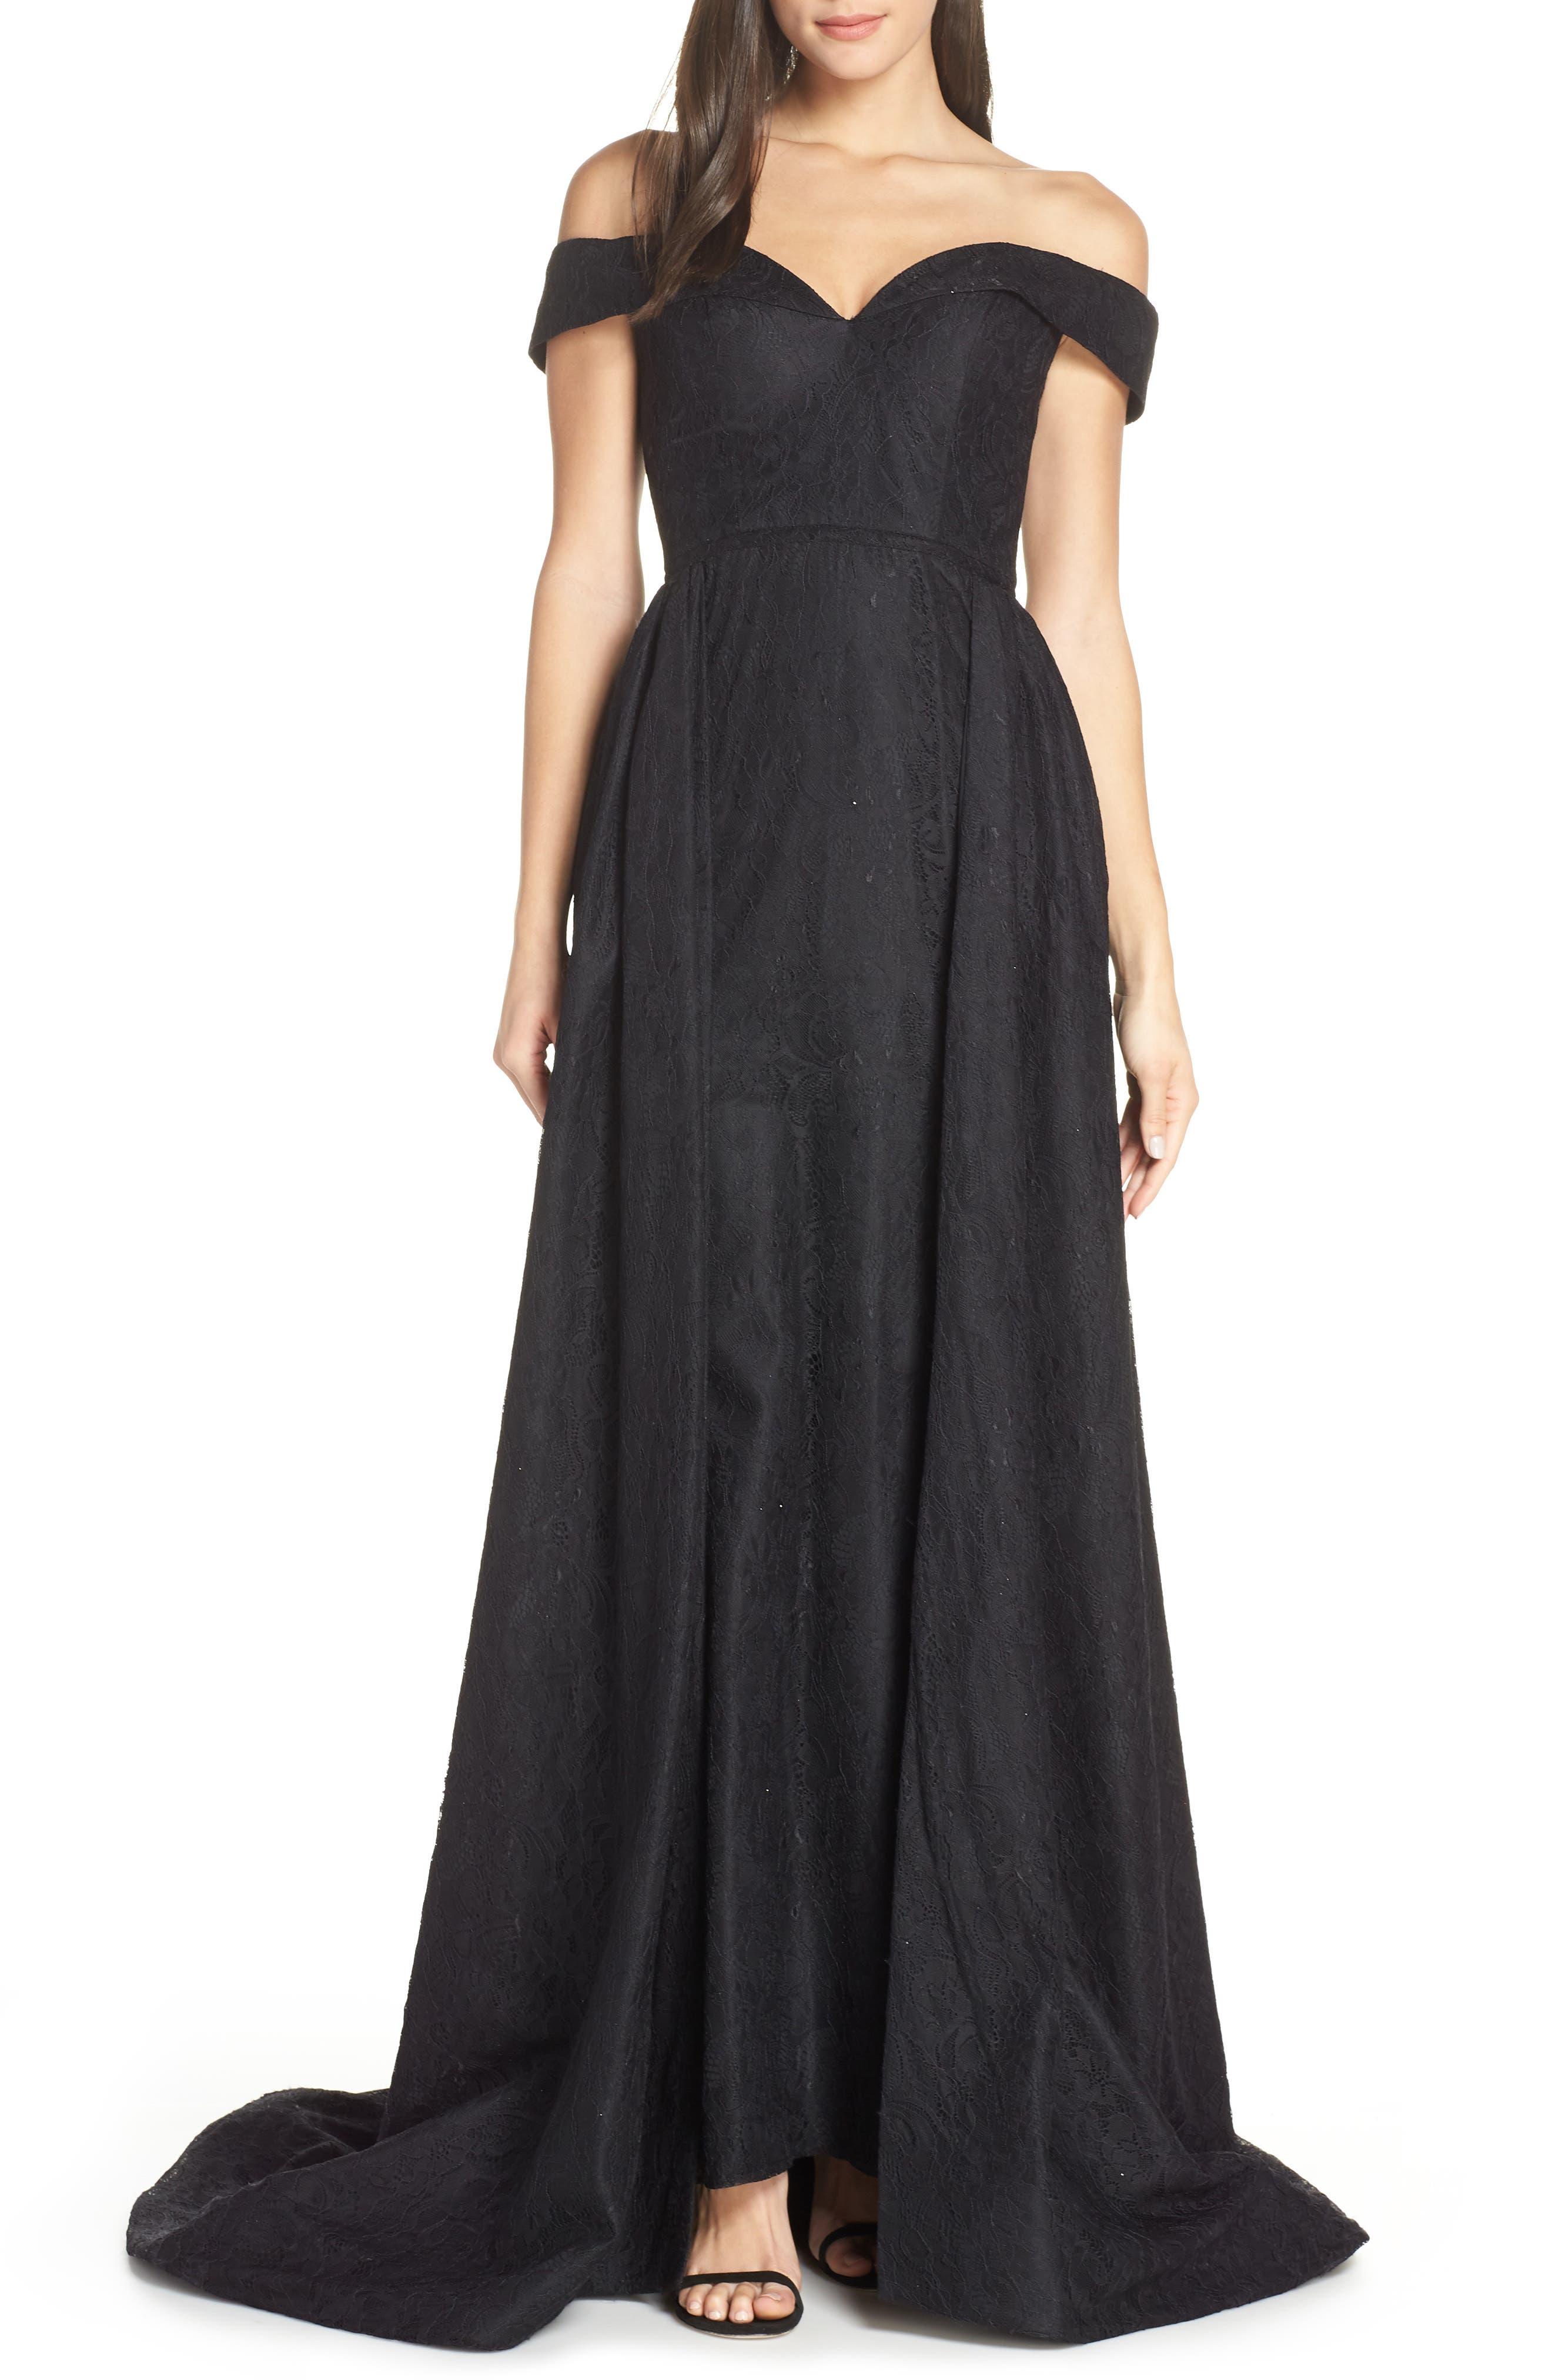 MAC DUGGAL, Off the Shoulder Lace Evening Dress, Main thumbnail 1, color, BLACK